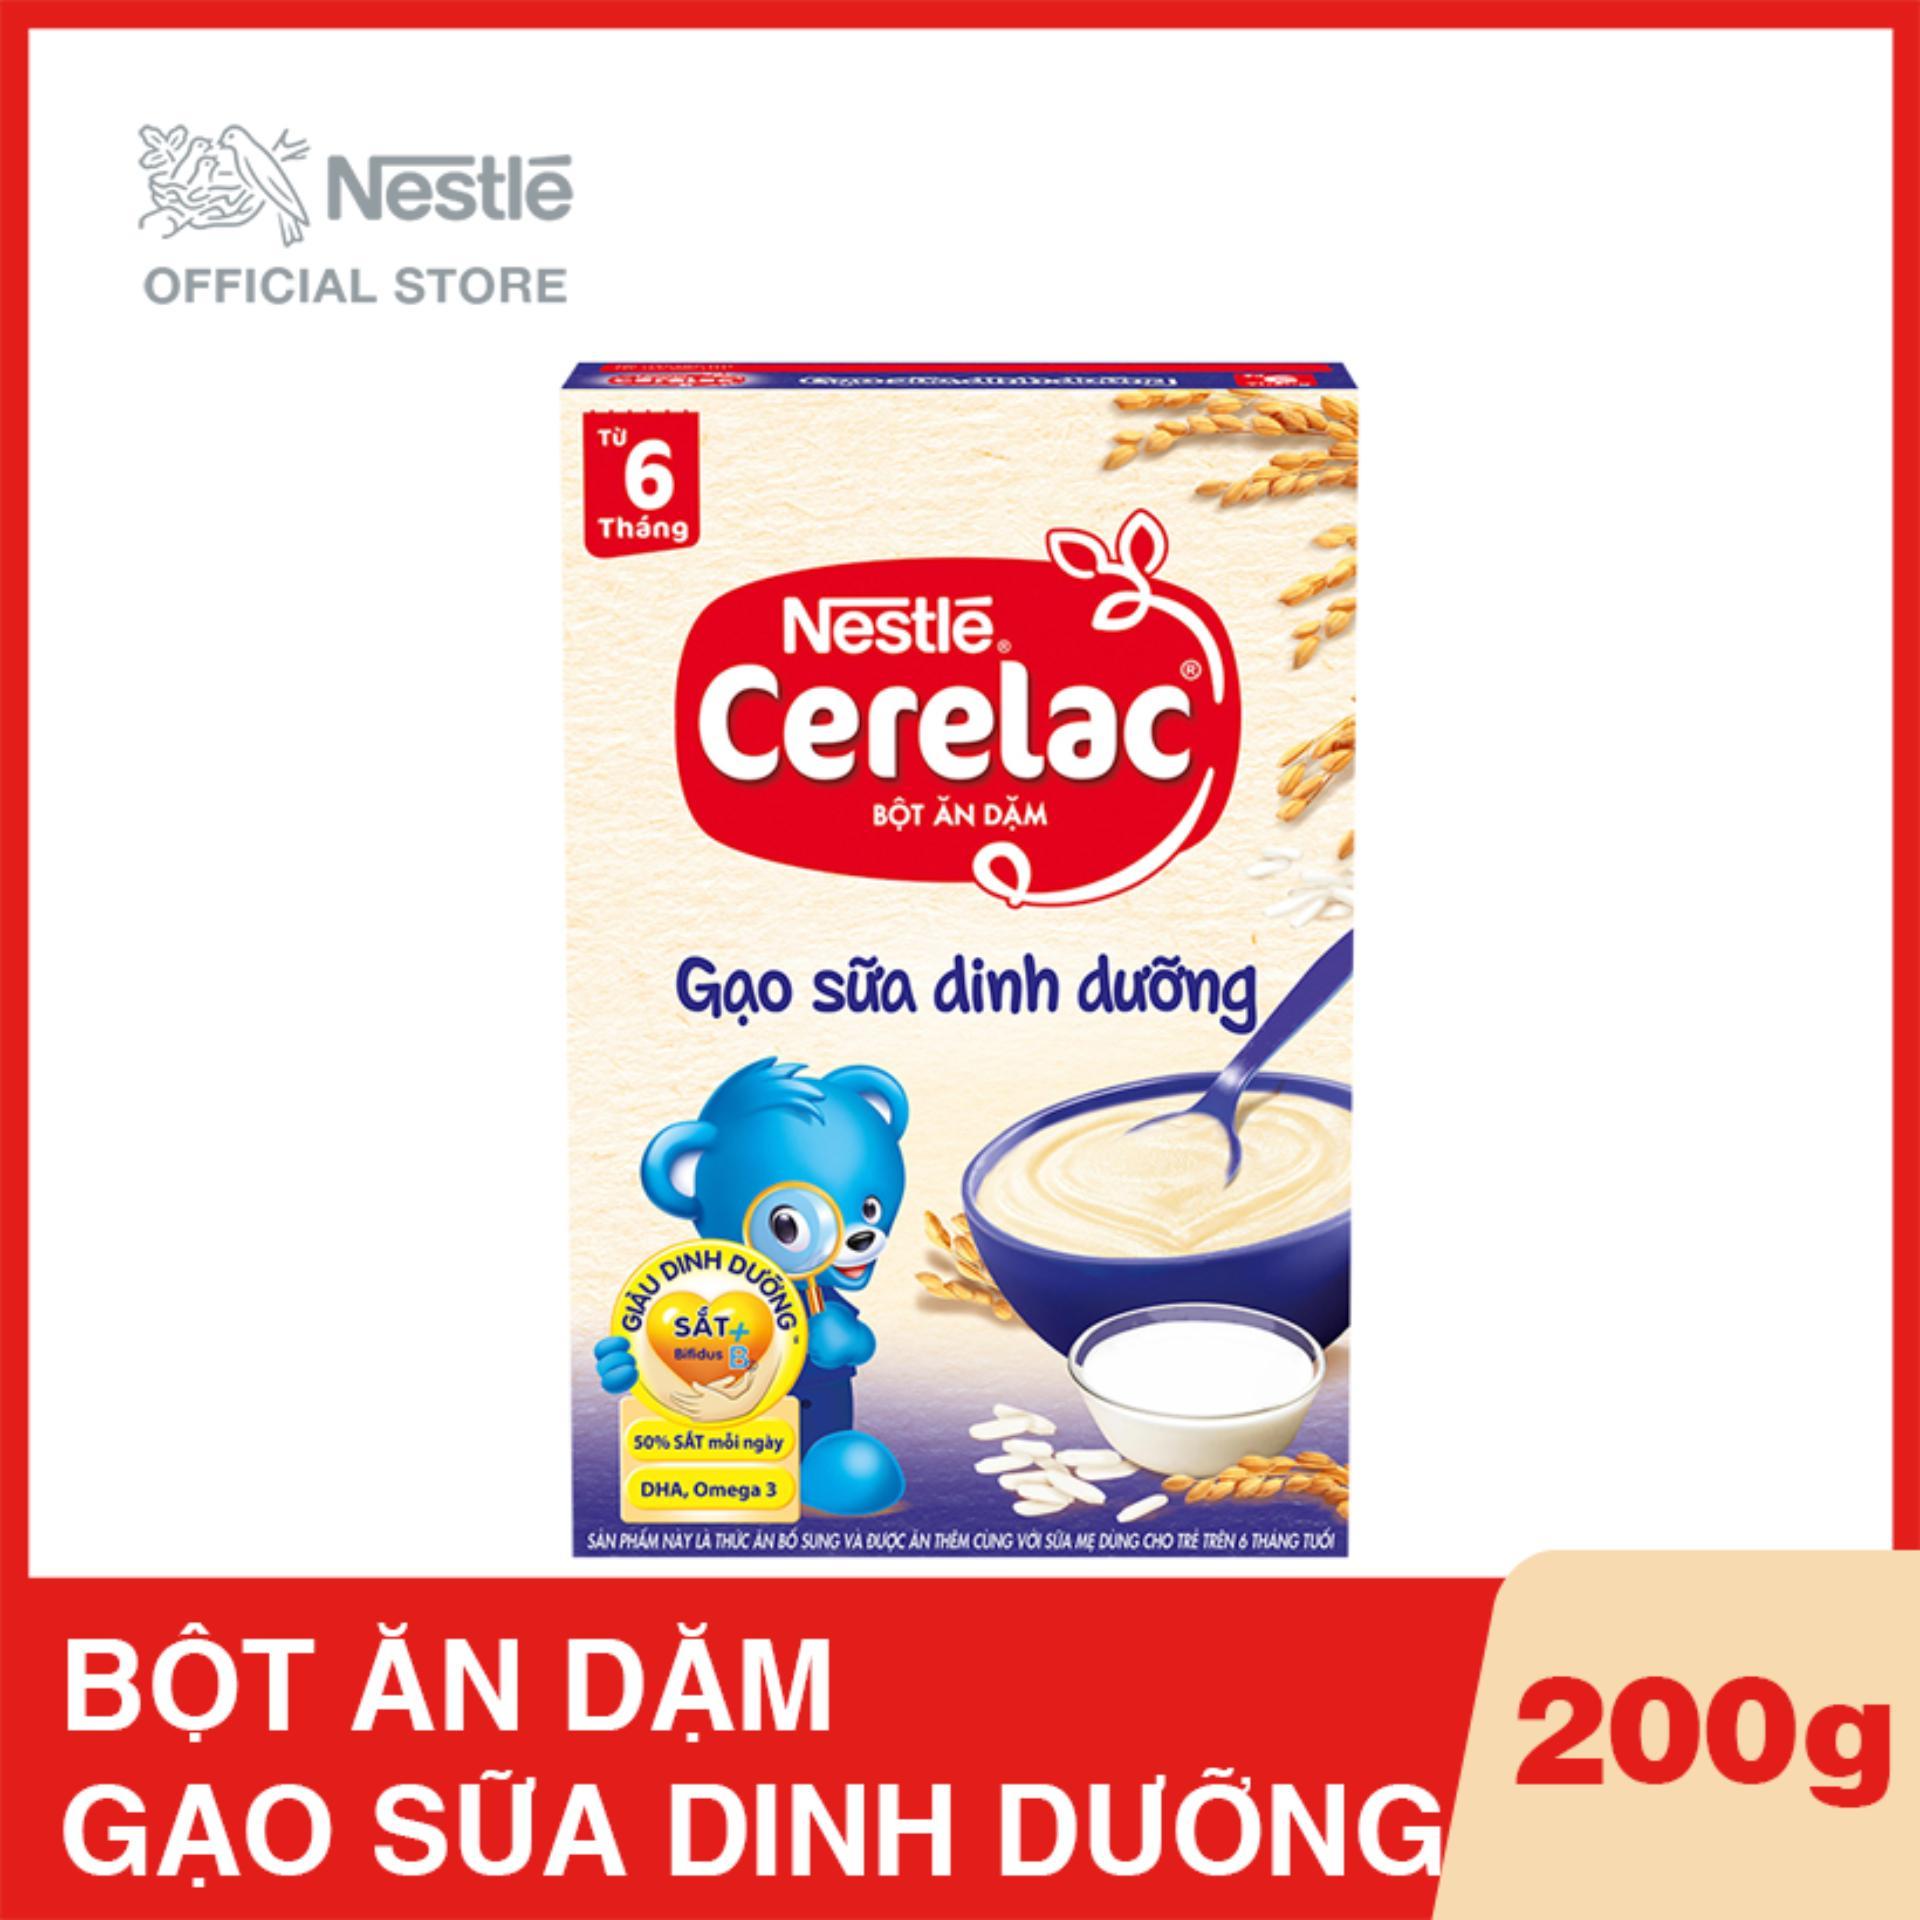 Bột ăn dặm Nestlé CERELAC Gạo Sữa Dinh Dưỡng 200g